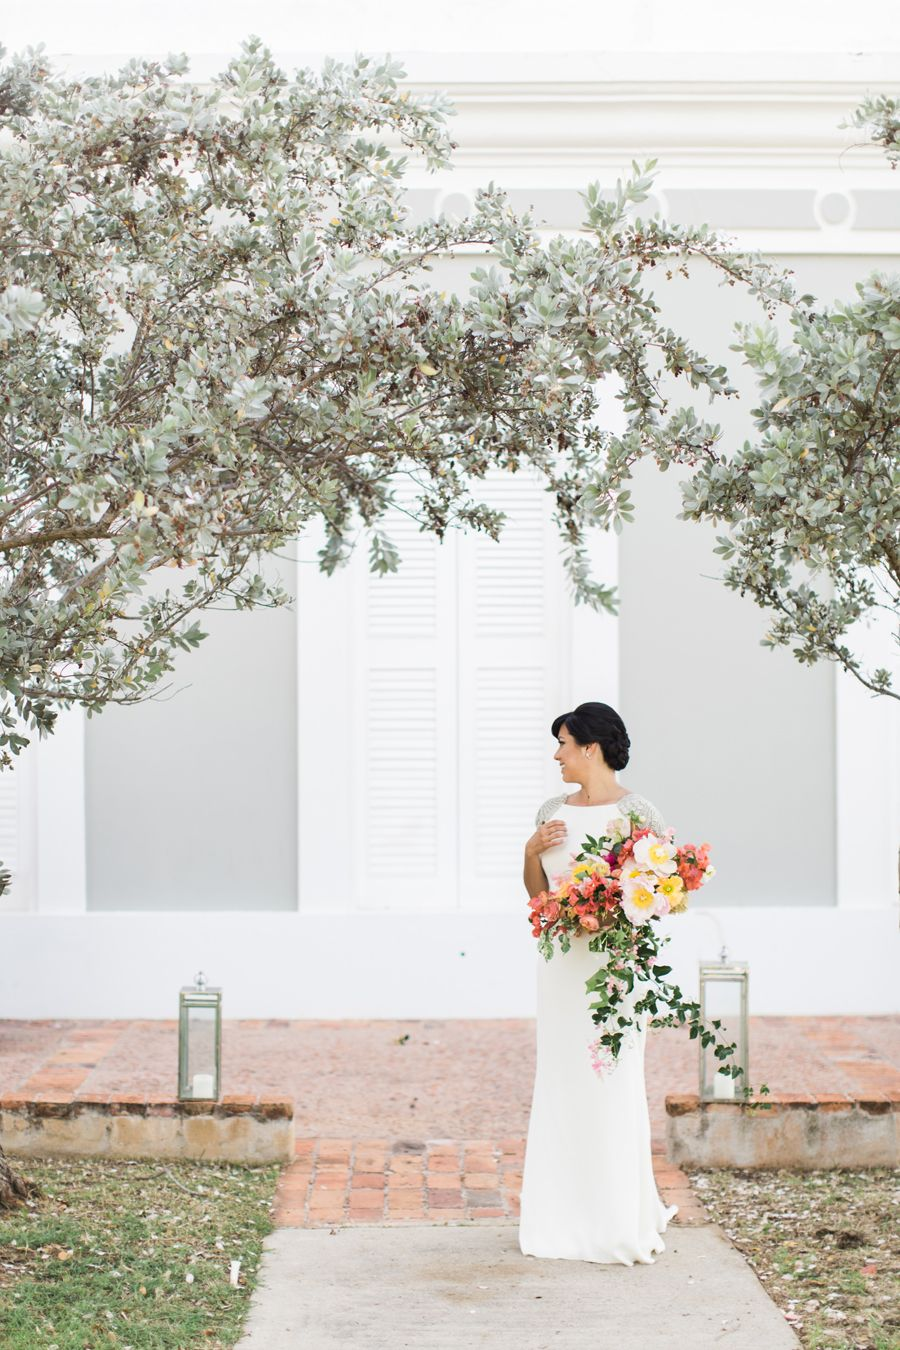 The Ultimate Destination Wedding Set in Puerto Rico